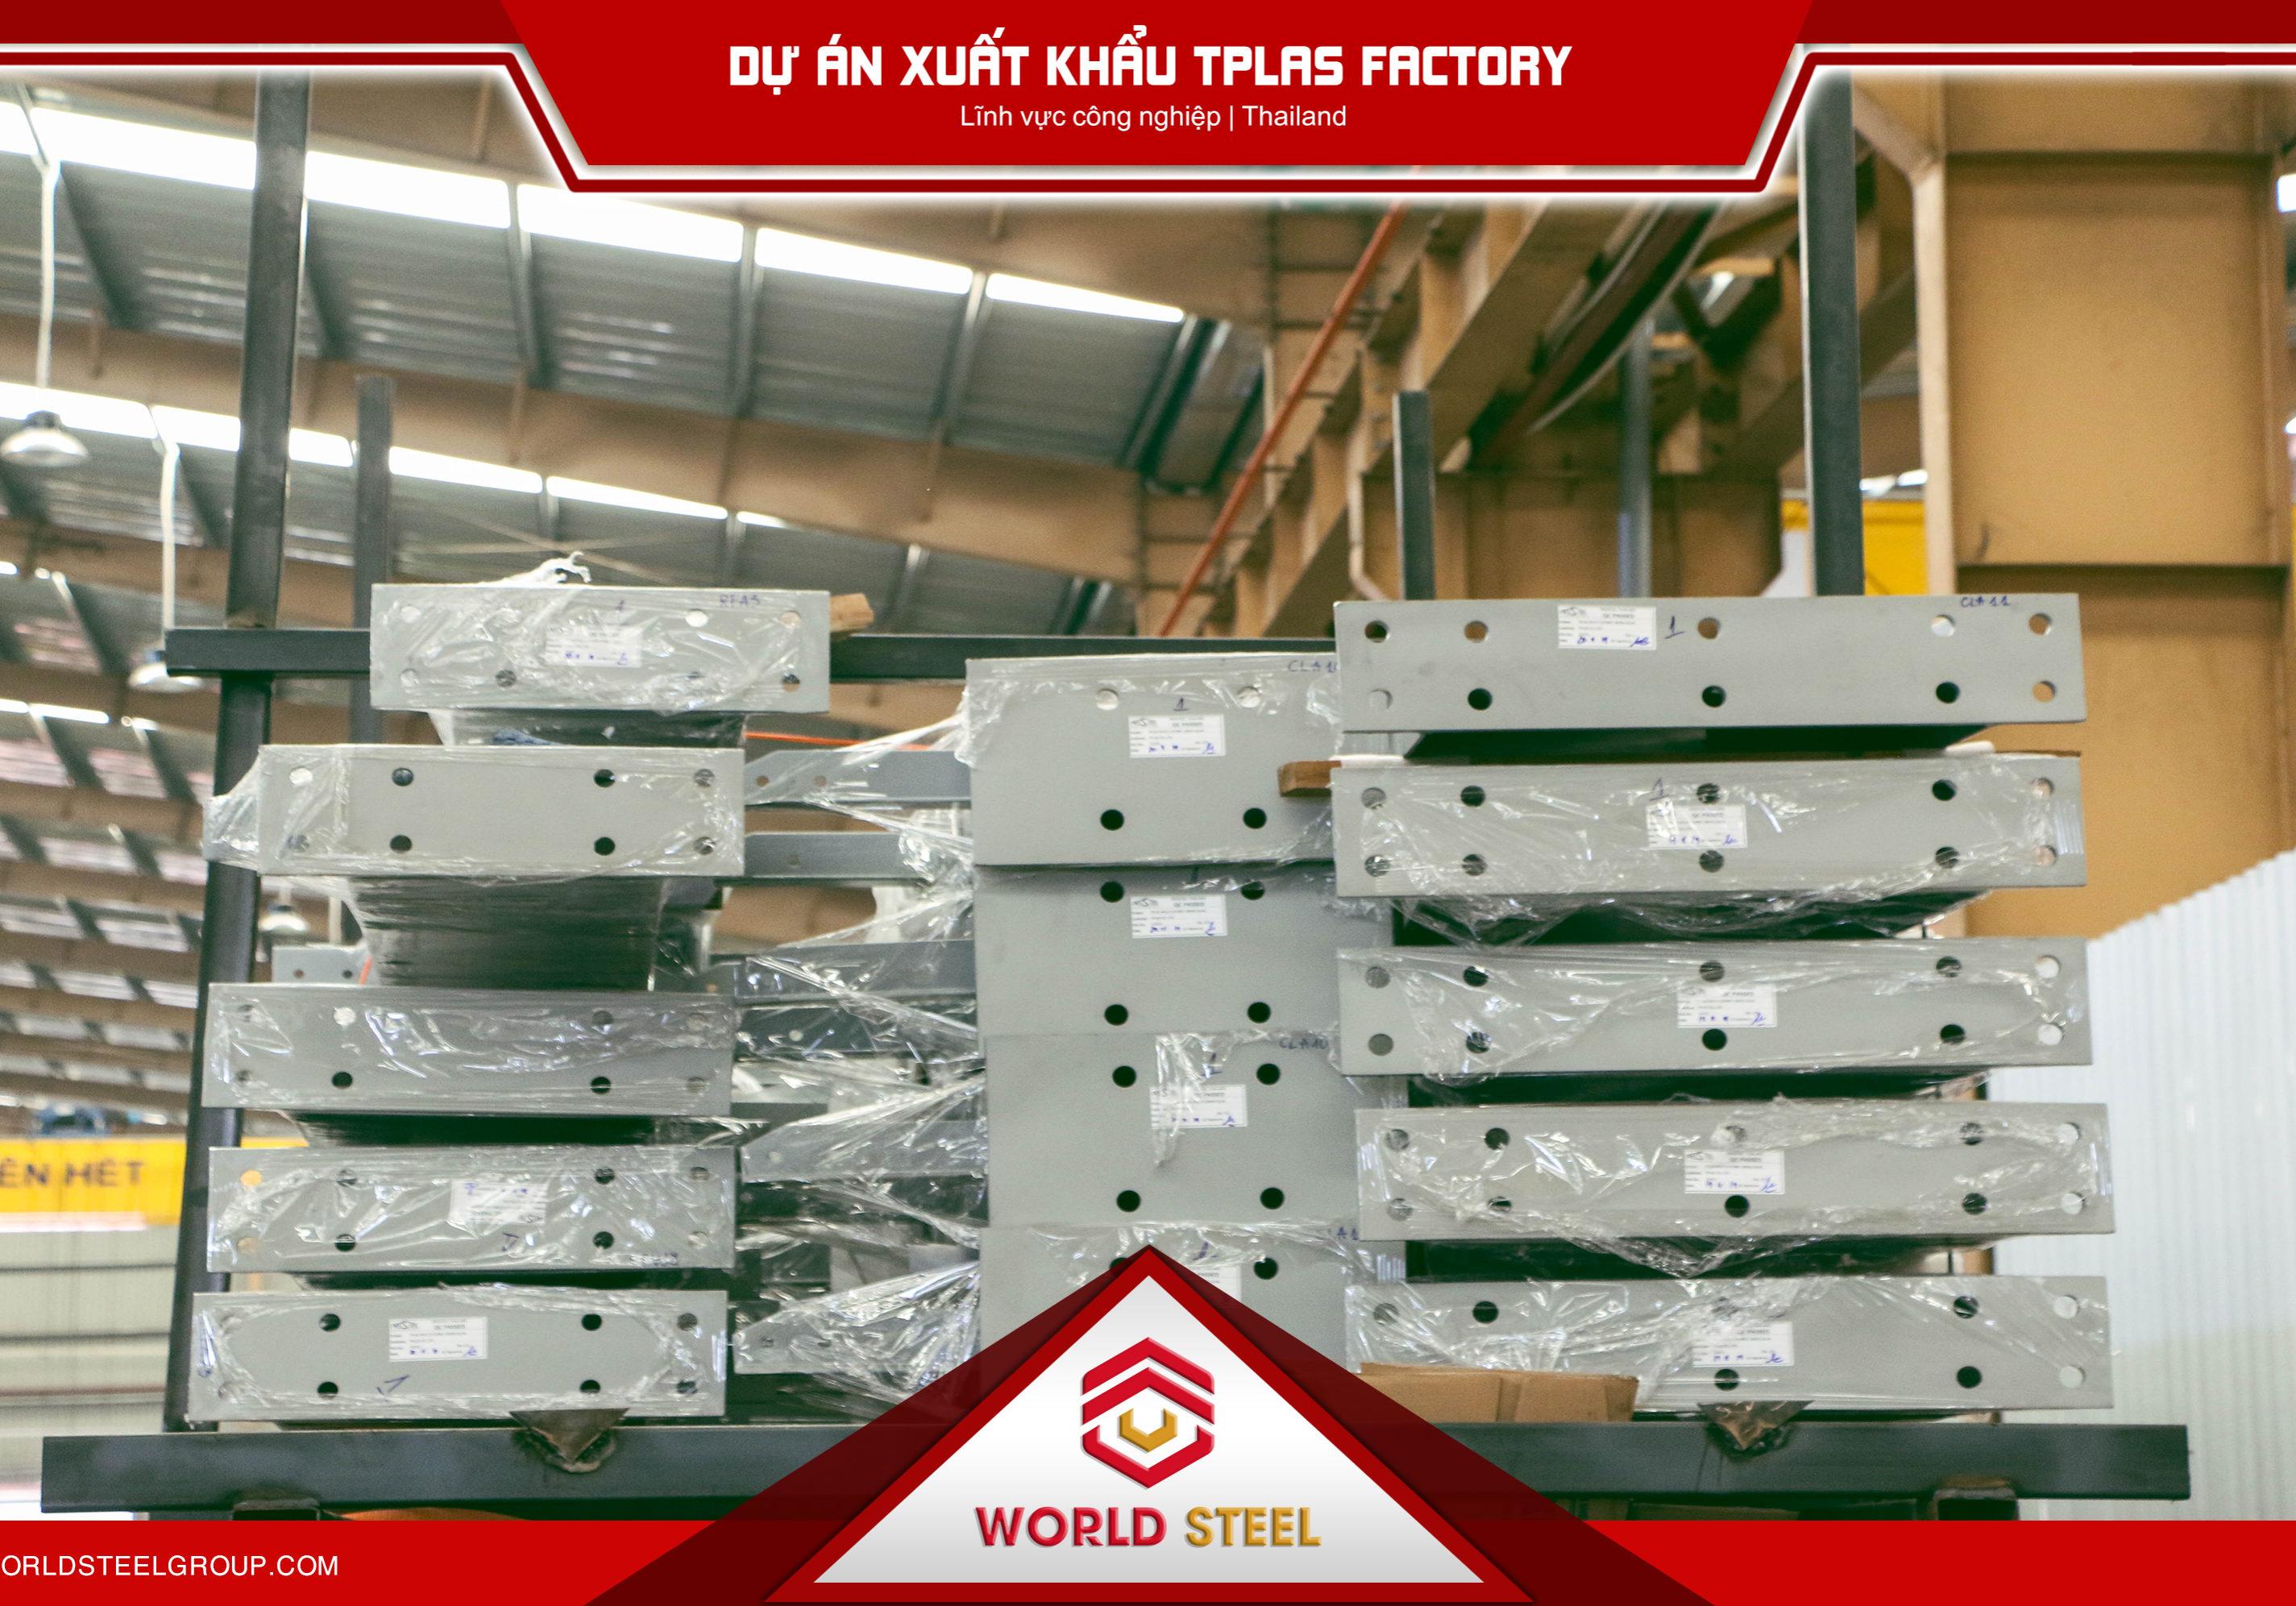 du-an-xuat-khau-ket-cau-thep-tplas-factory-2